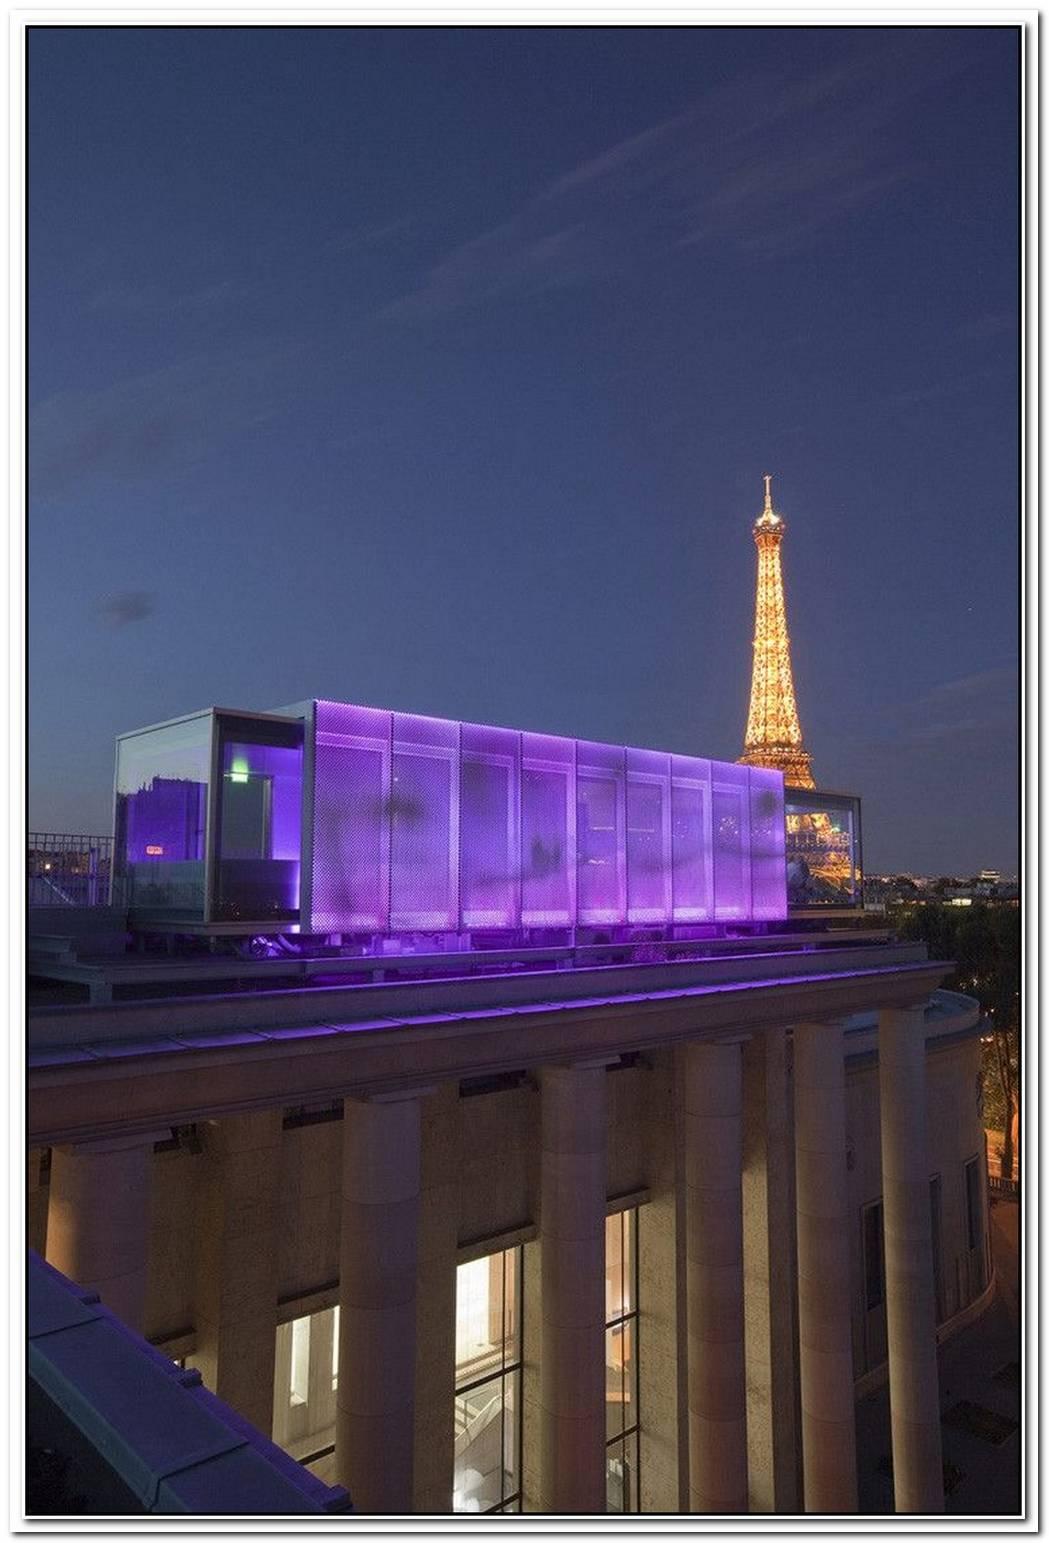 Nomiya Space Restaurant At Palais De Tokyo In Paris